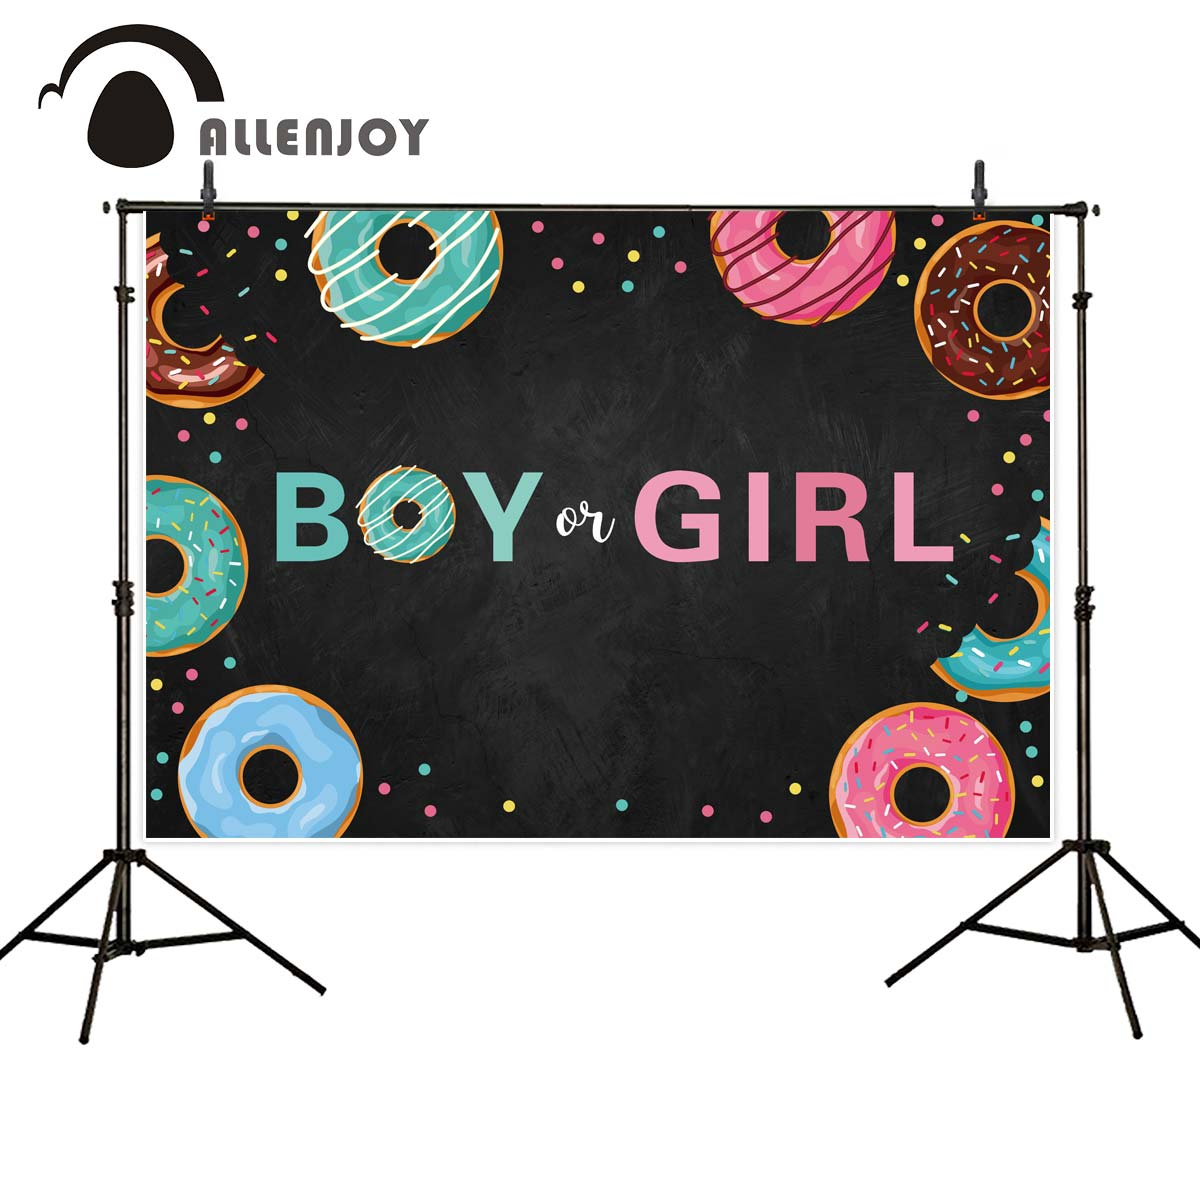 Allenjoy Donut Blackboard Background Banner Baby Shower Boy Or Girl Dot Backdrops Wallpaper Gender Reveal Party Photobooth Decor Party Backdrops Aliexpress